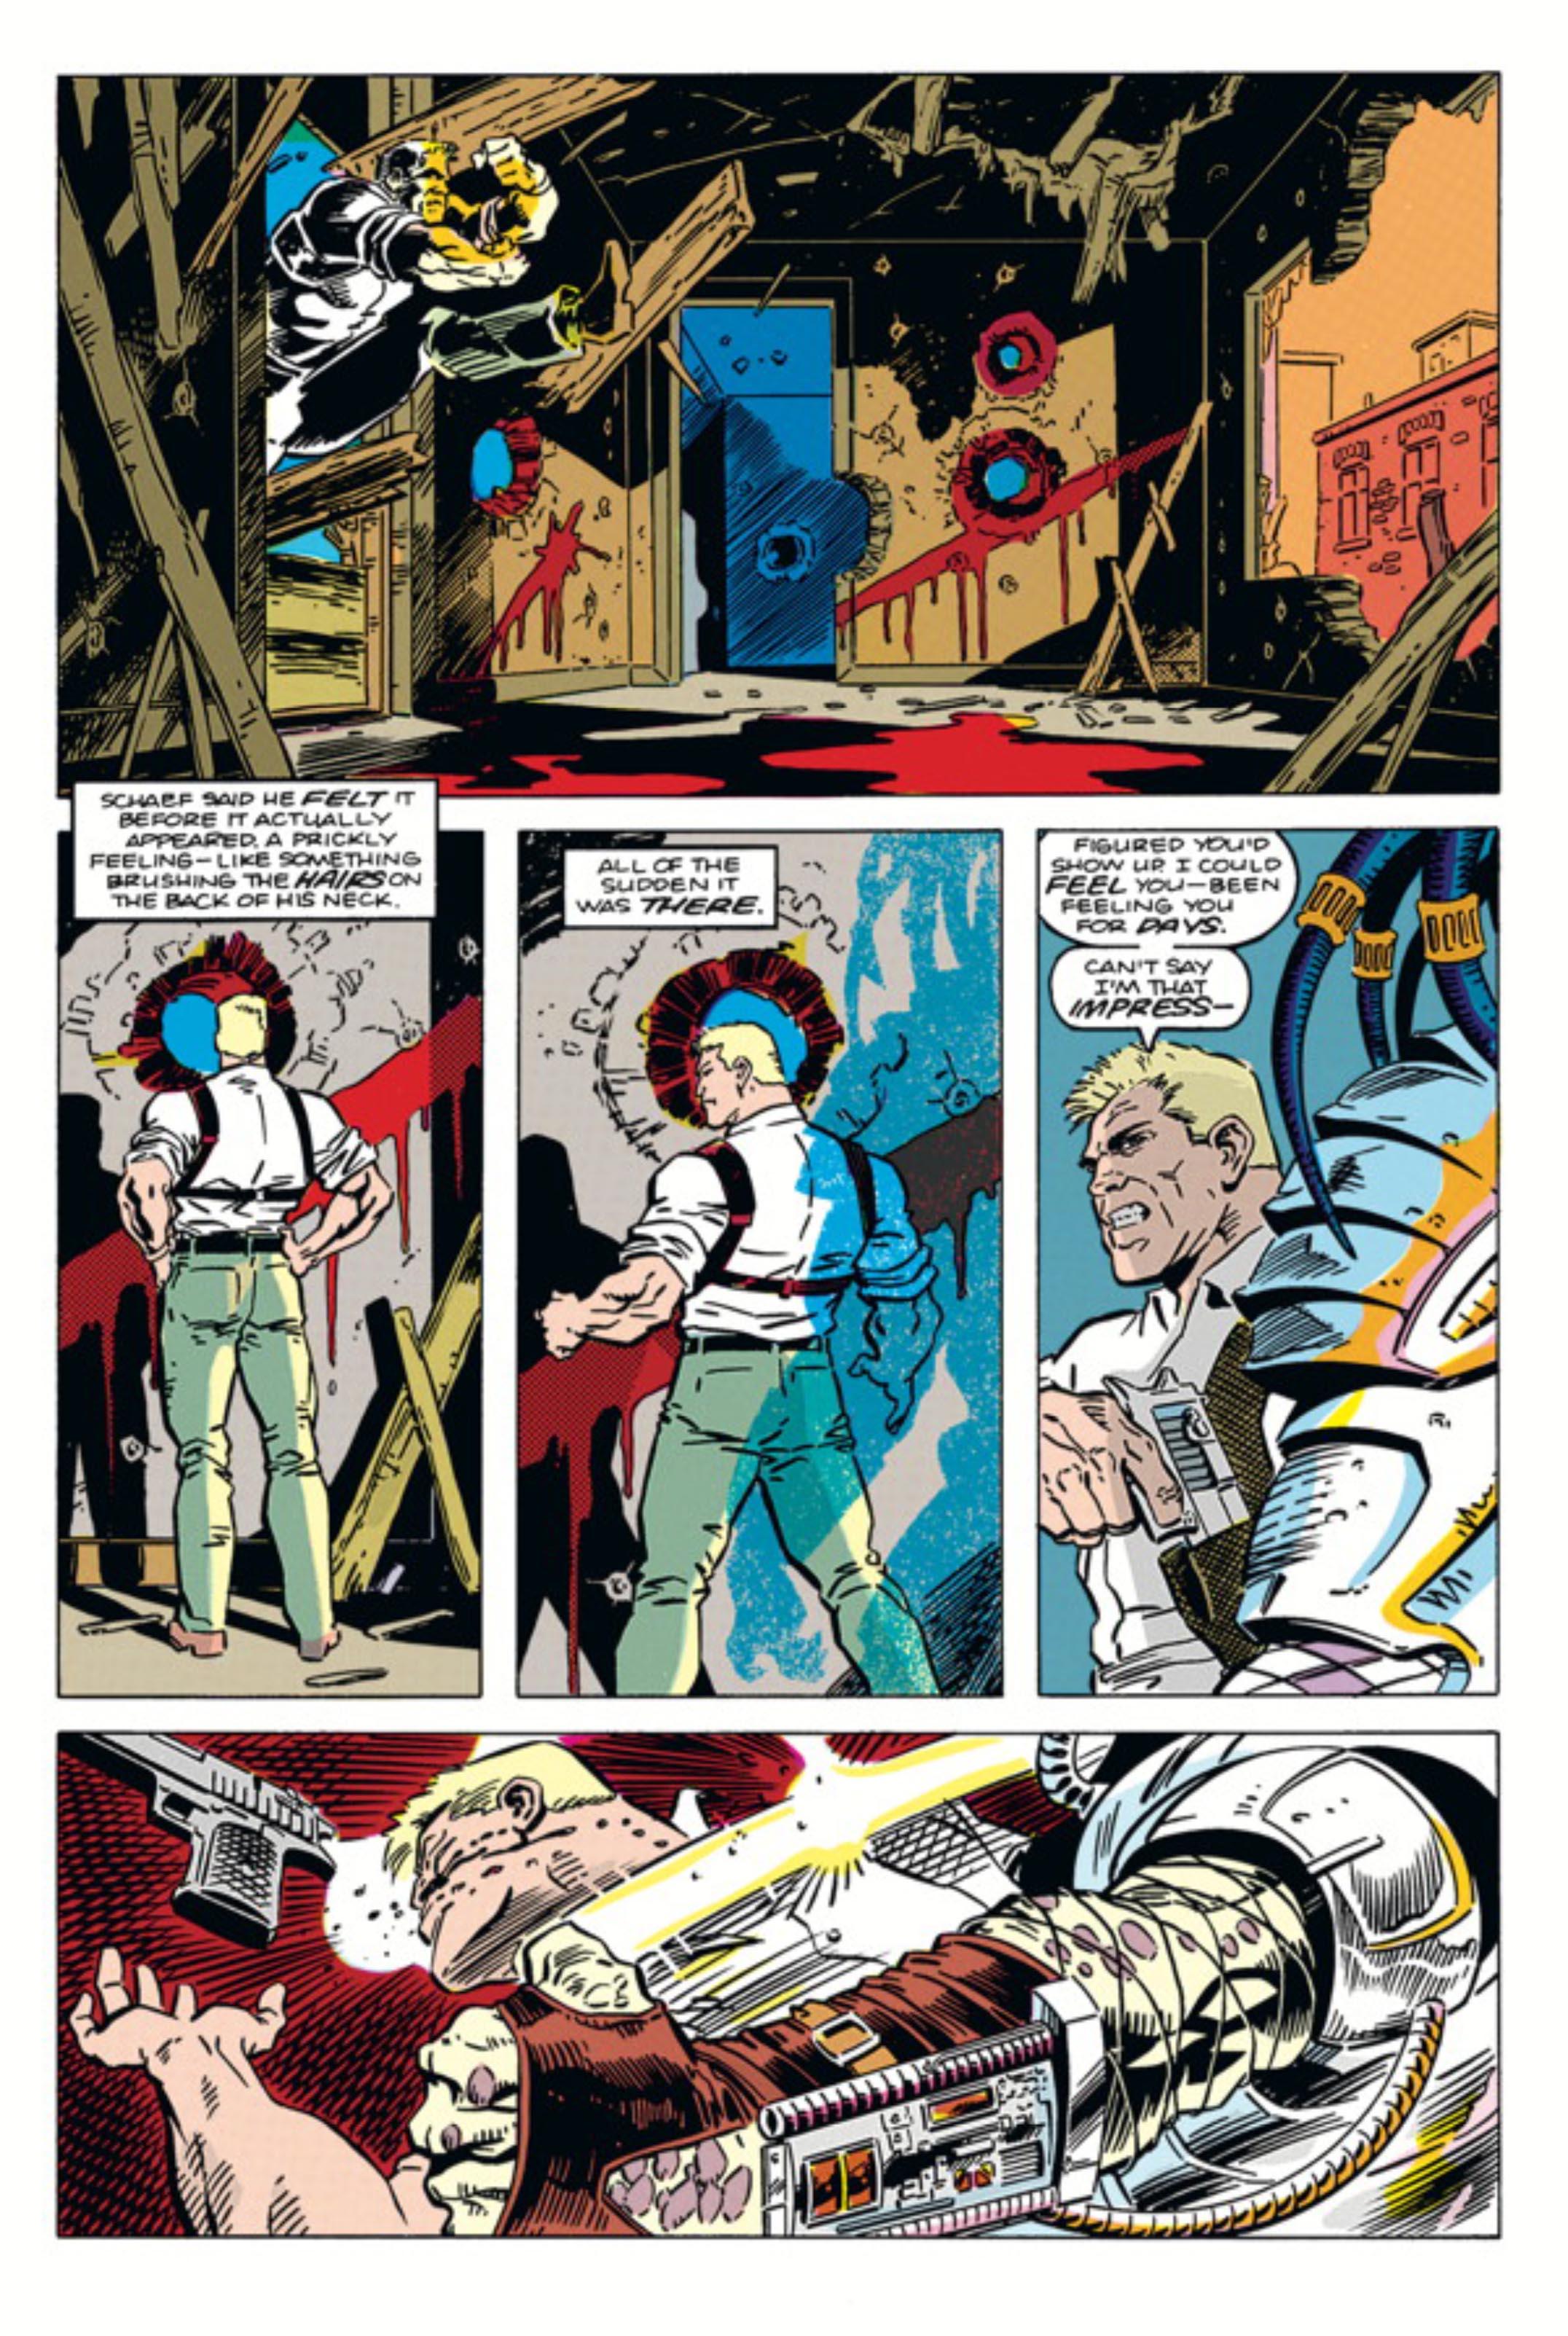 Predator: The Original Comics Series--Concrete Jungle and Other